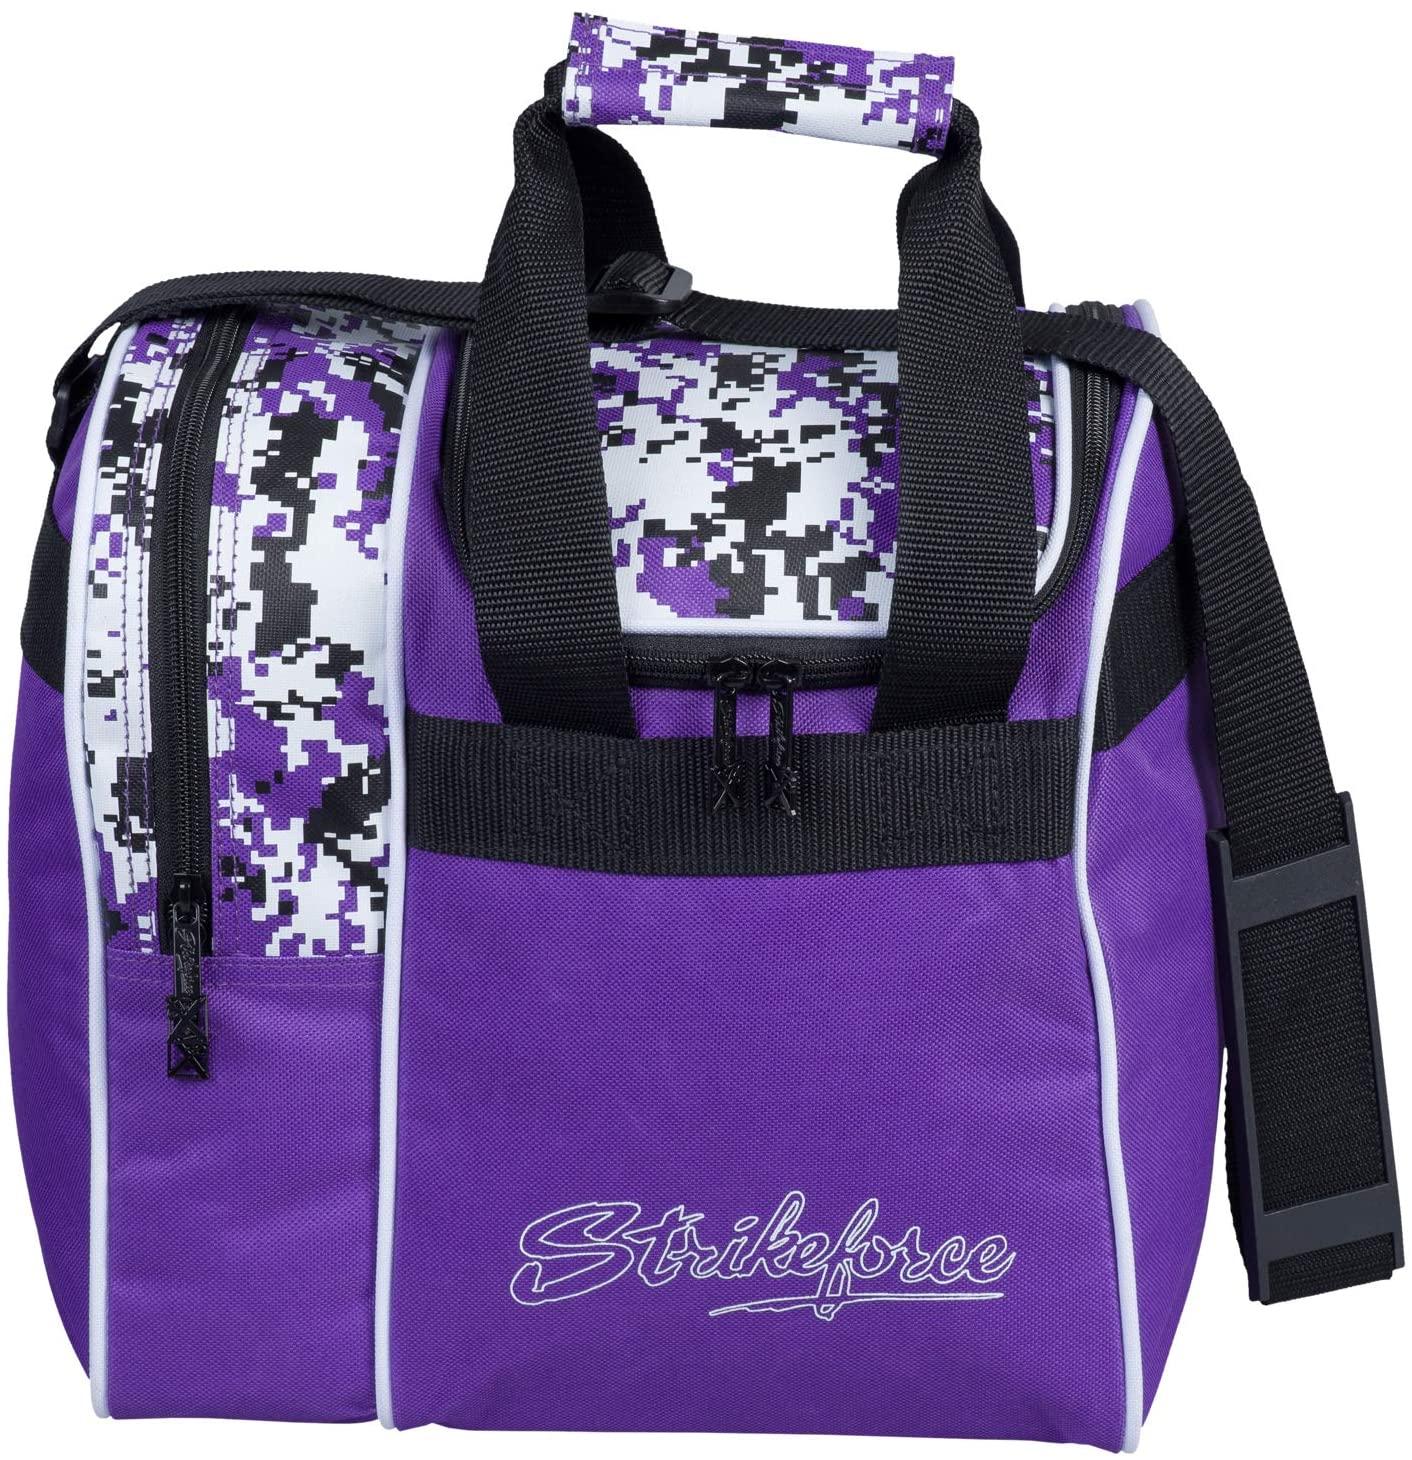 KR Strikeforce Rook Single Bowling Ball Tote Bag, Purple Digi Camo